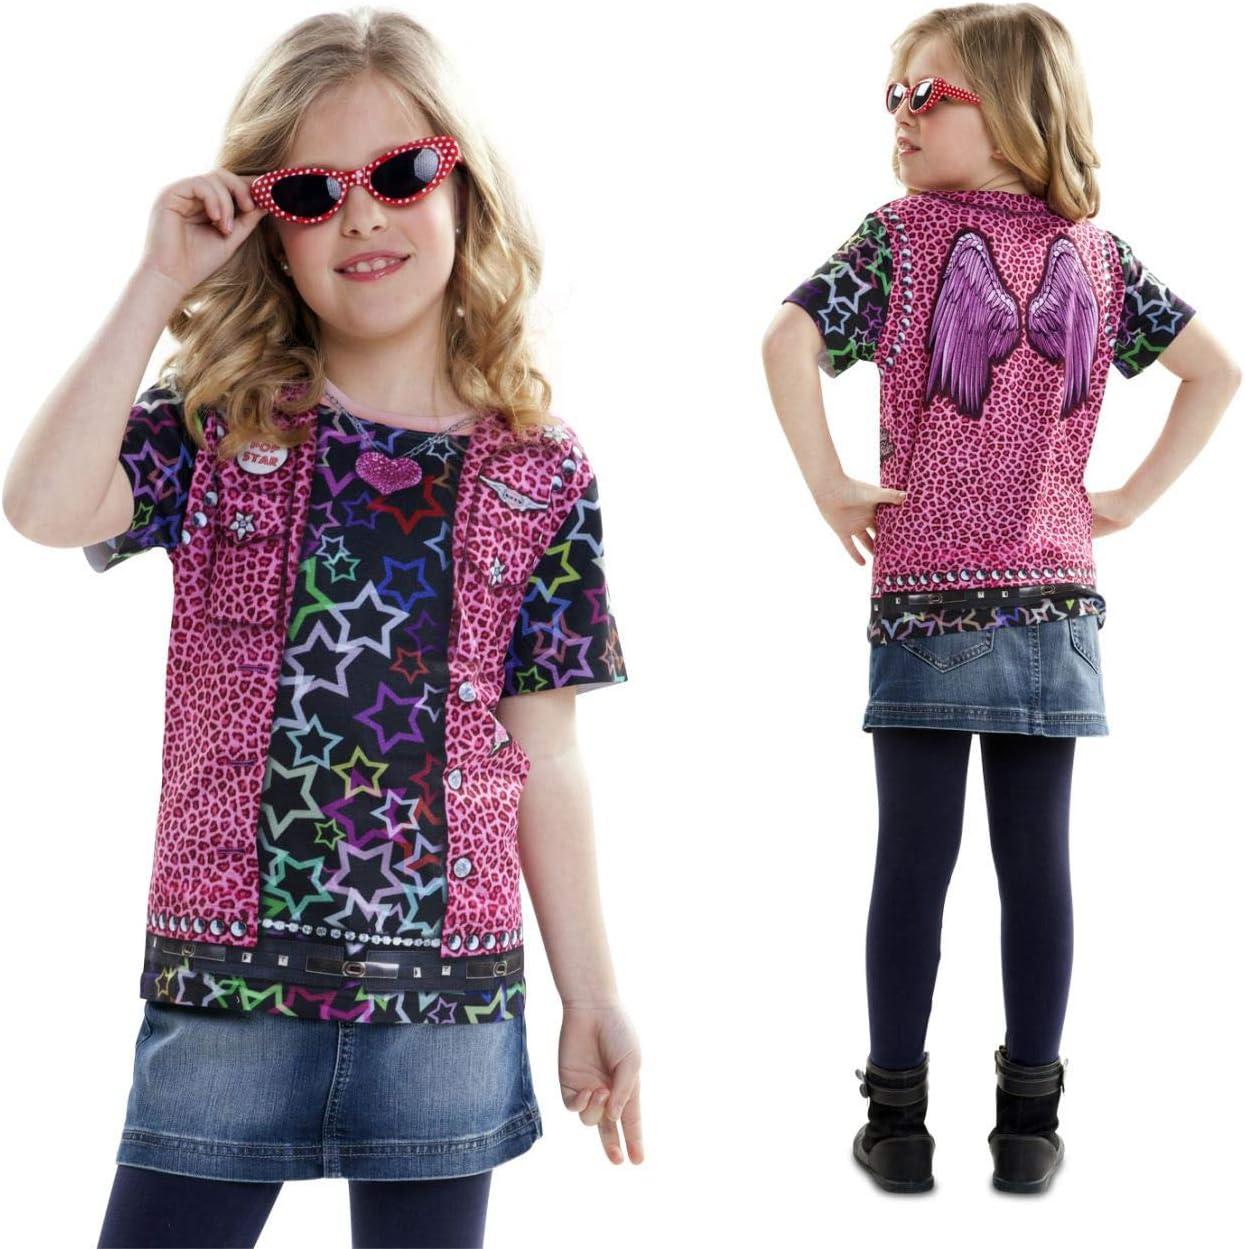 Disfraz Camiseta de Rapero Original de Carnaval para niña de 2-4 ...